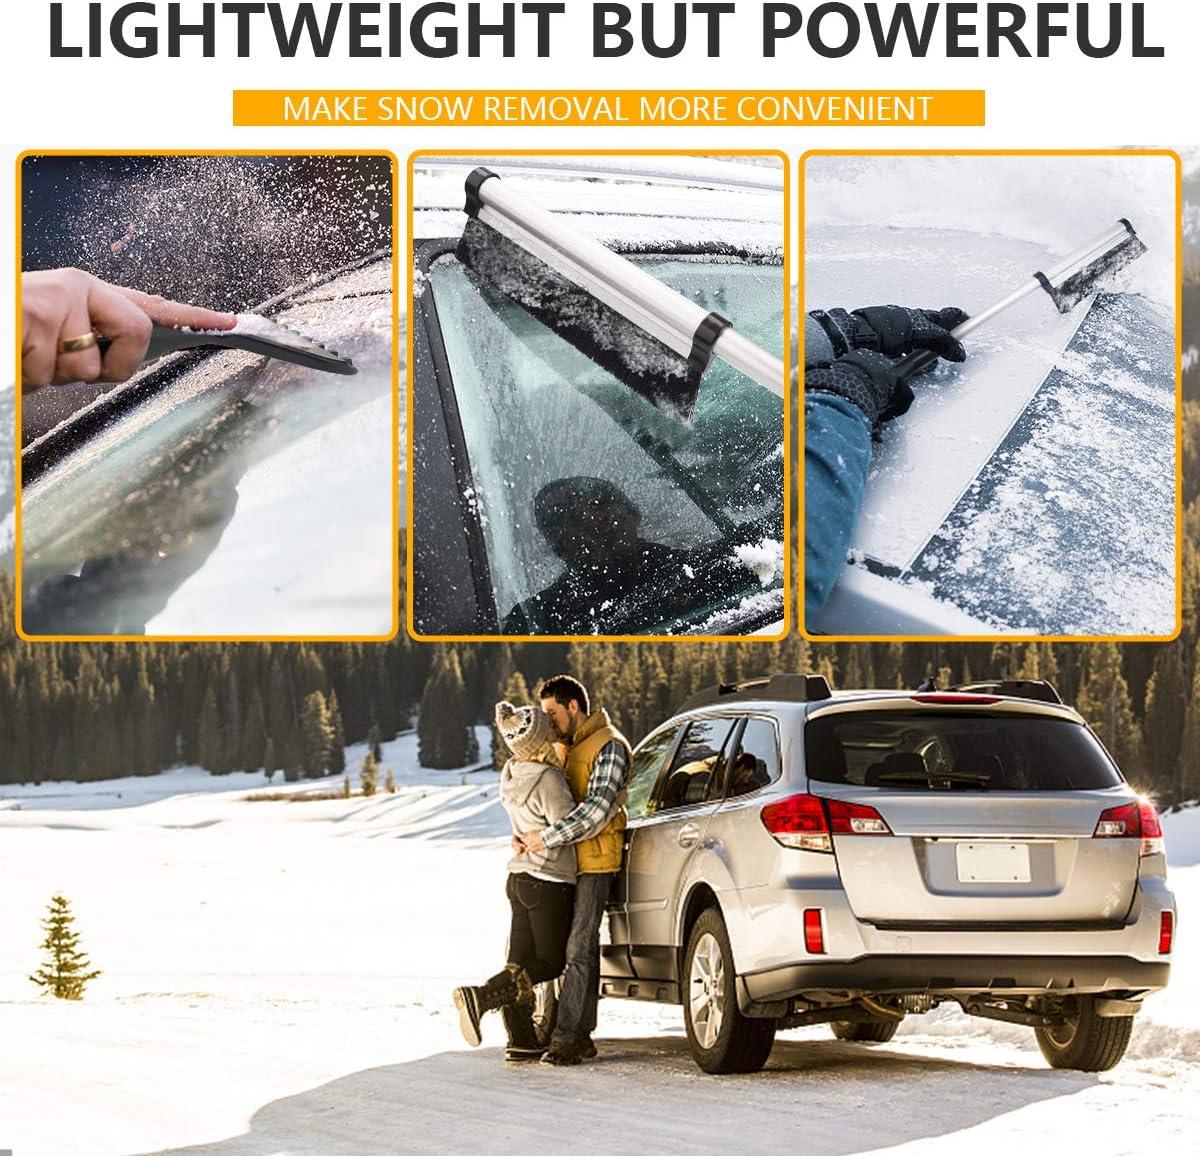 Durable ABS /& Aluminum Alloy Snow Remover Tool Truck Windshield Windows Auto SUV Snow Brush for Car Kalapo 26 Car Snow Brush Extra Long Extendable Ice Scraper Black